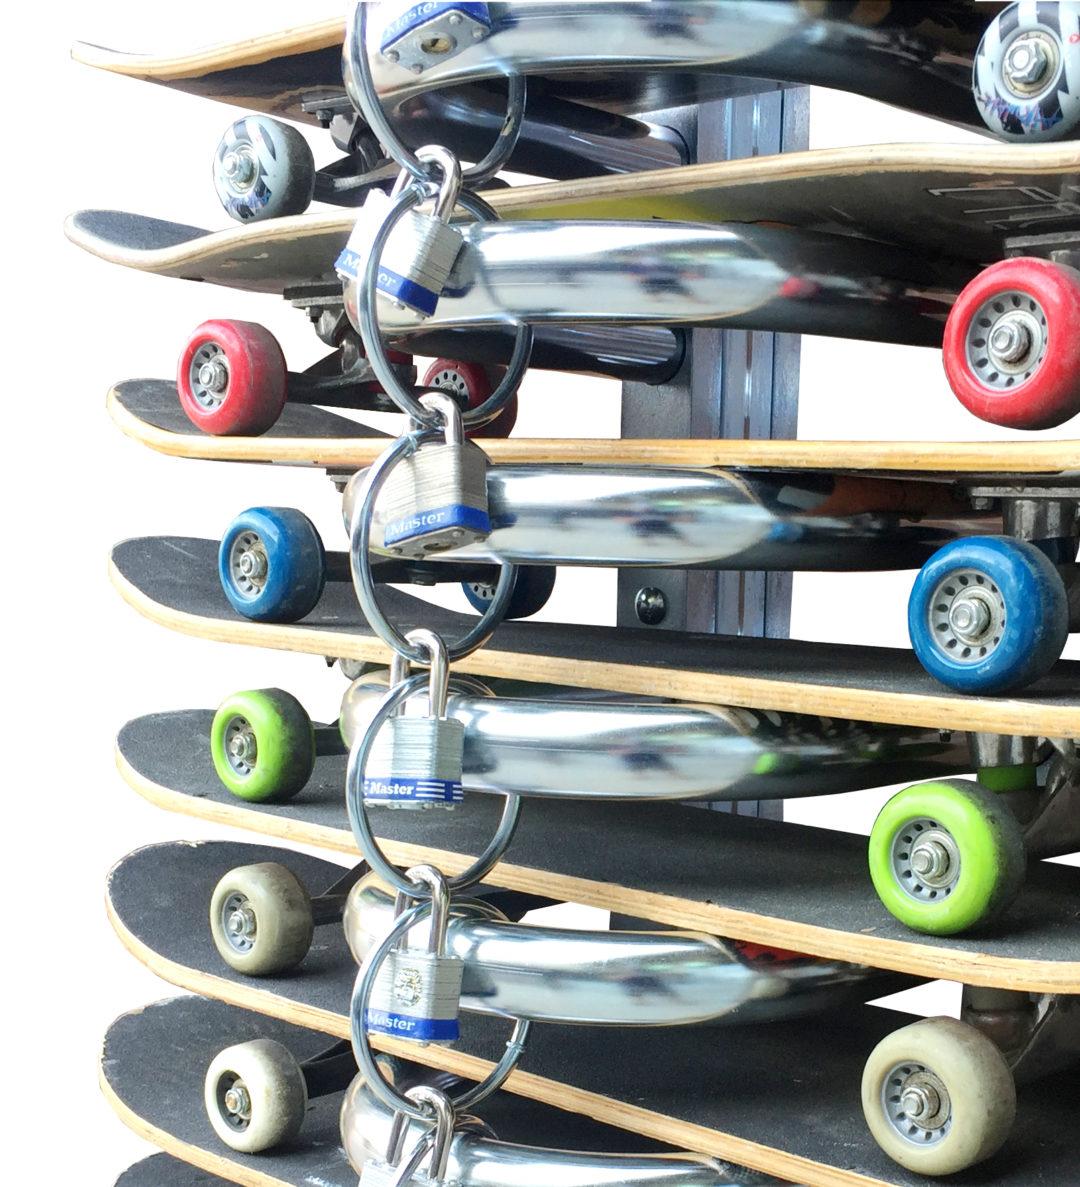 skateboard rack with locks - Spartan